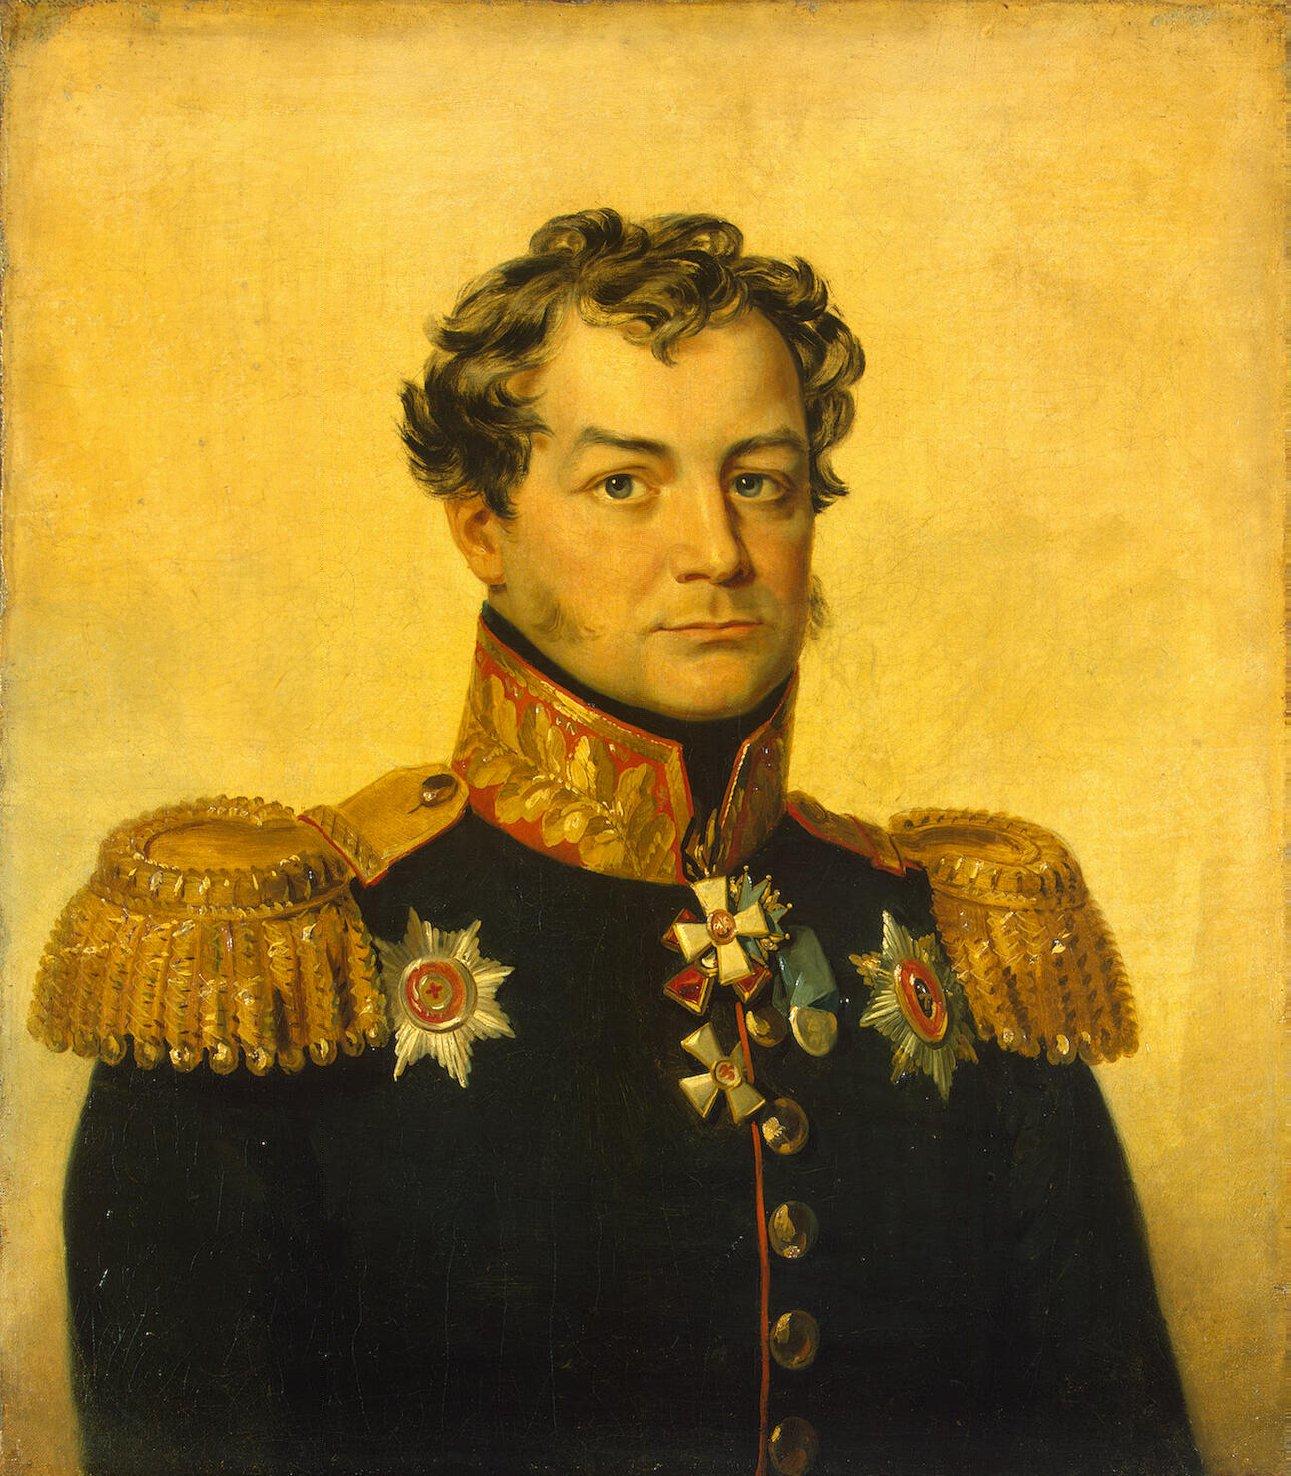 Казачковский, Кирилл Фёдорович